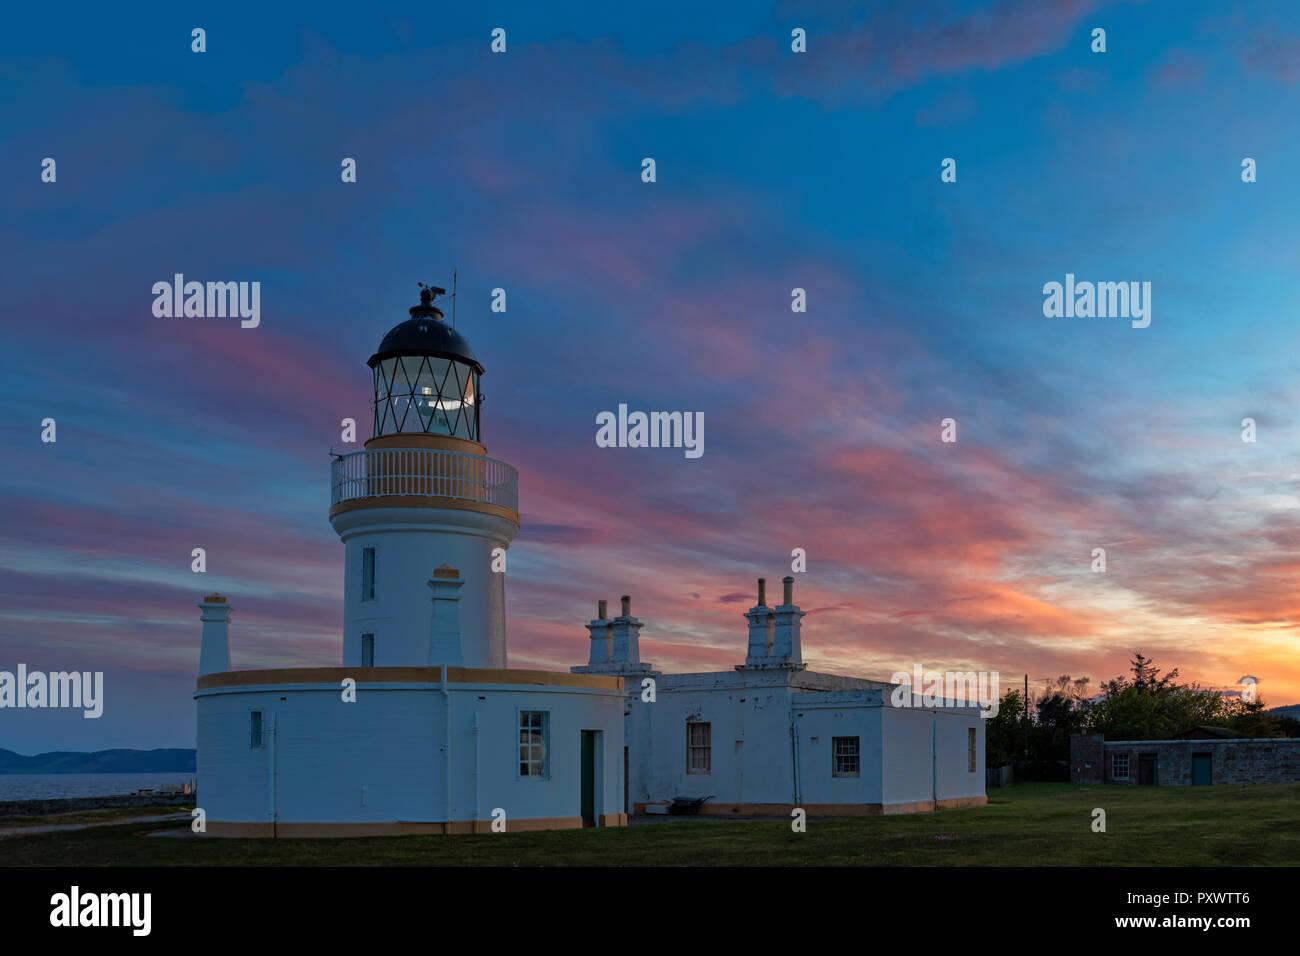 UK, Scotland, Black Isle, Chanonry Ness, Chanonry Point, Chanonry Lighthouse at sunset - Stock Image